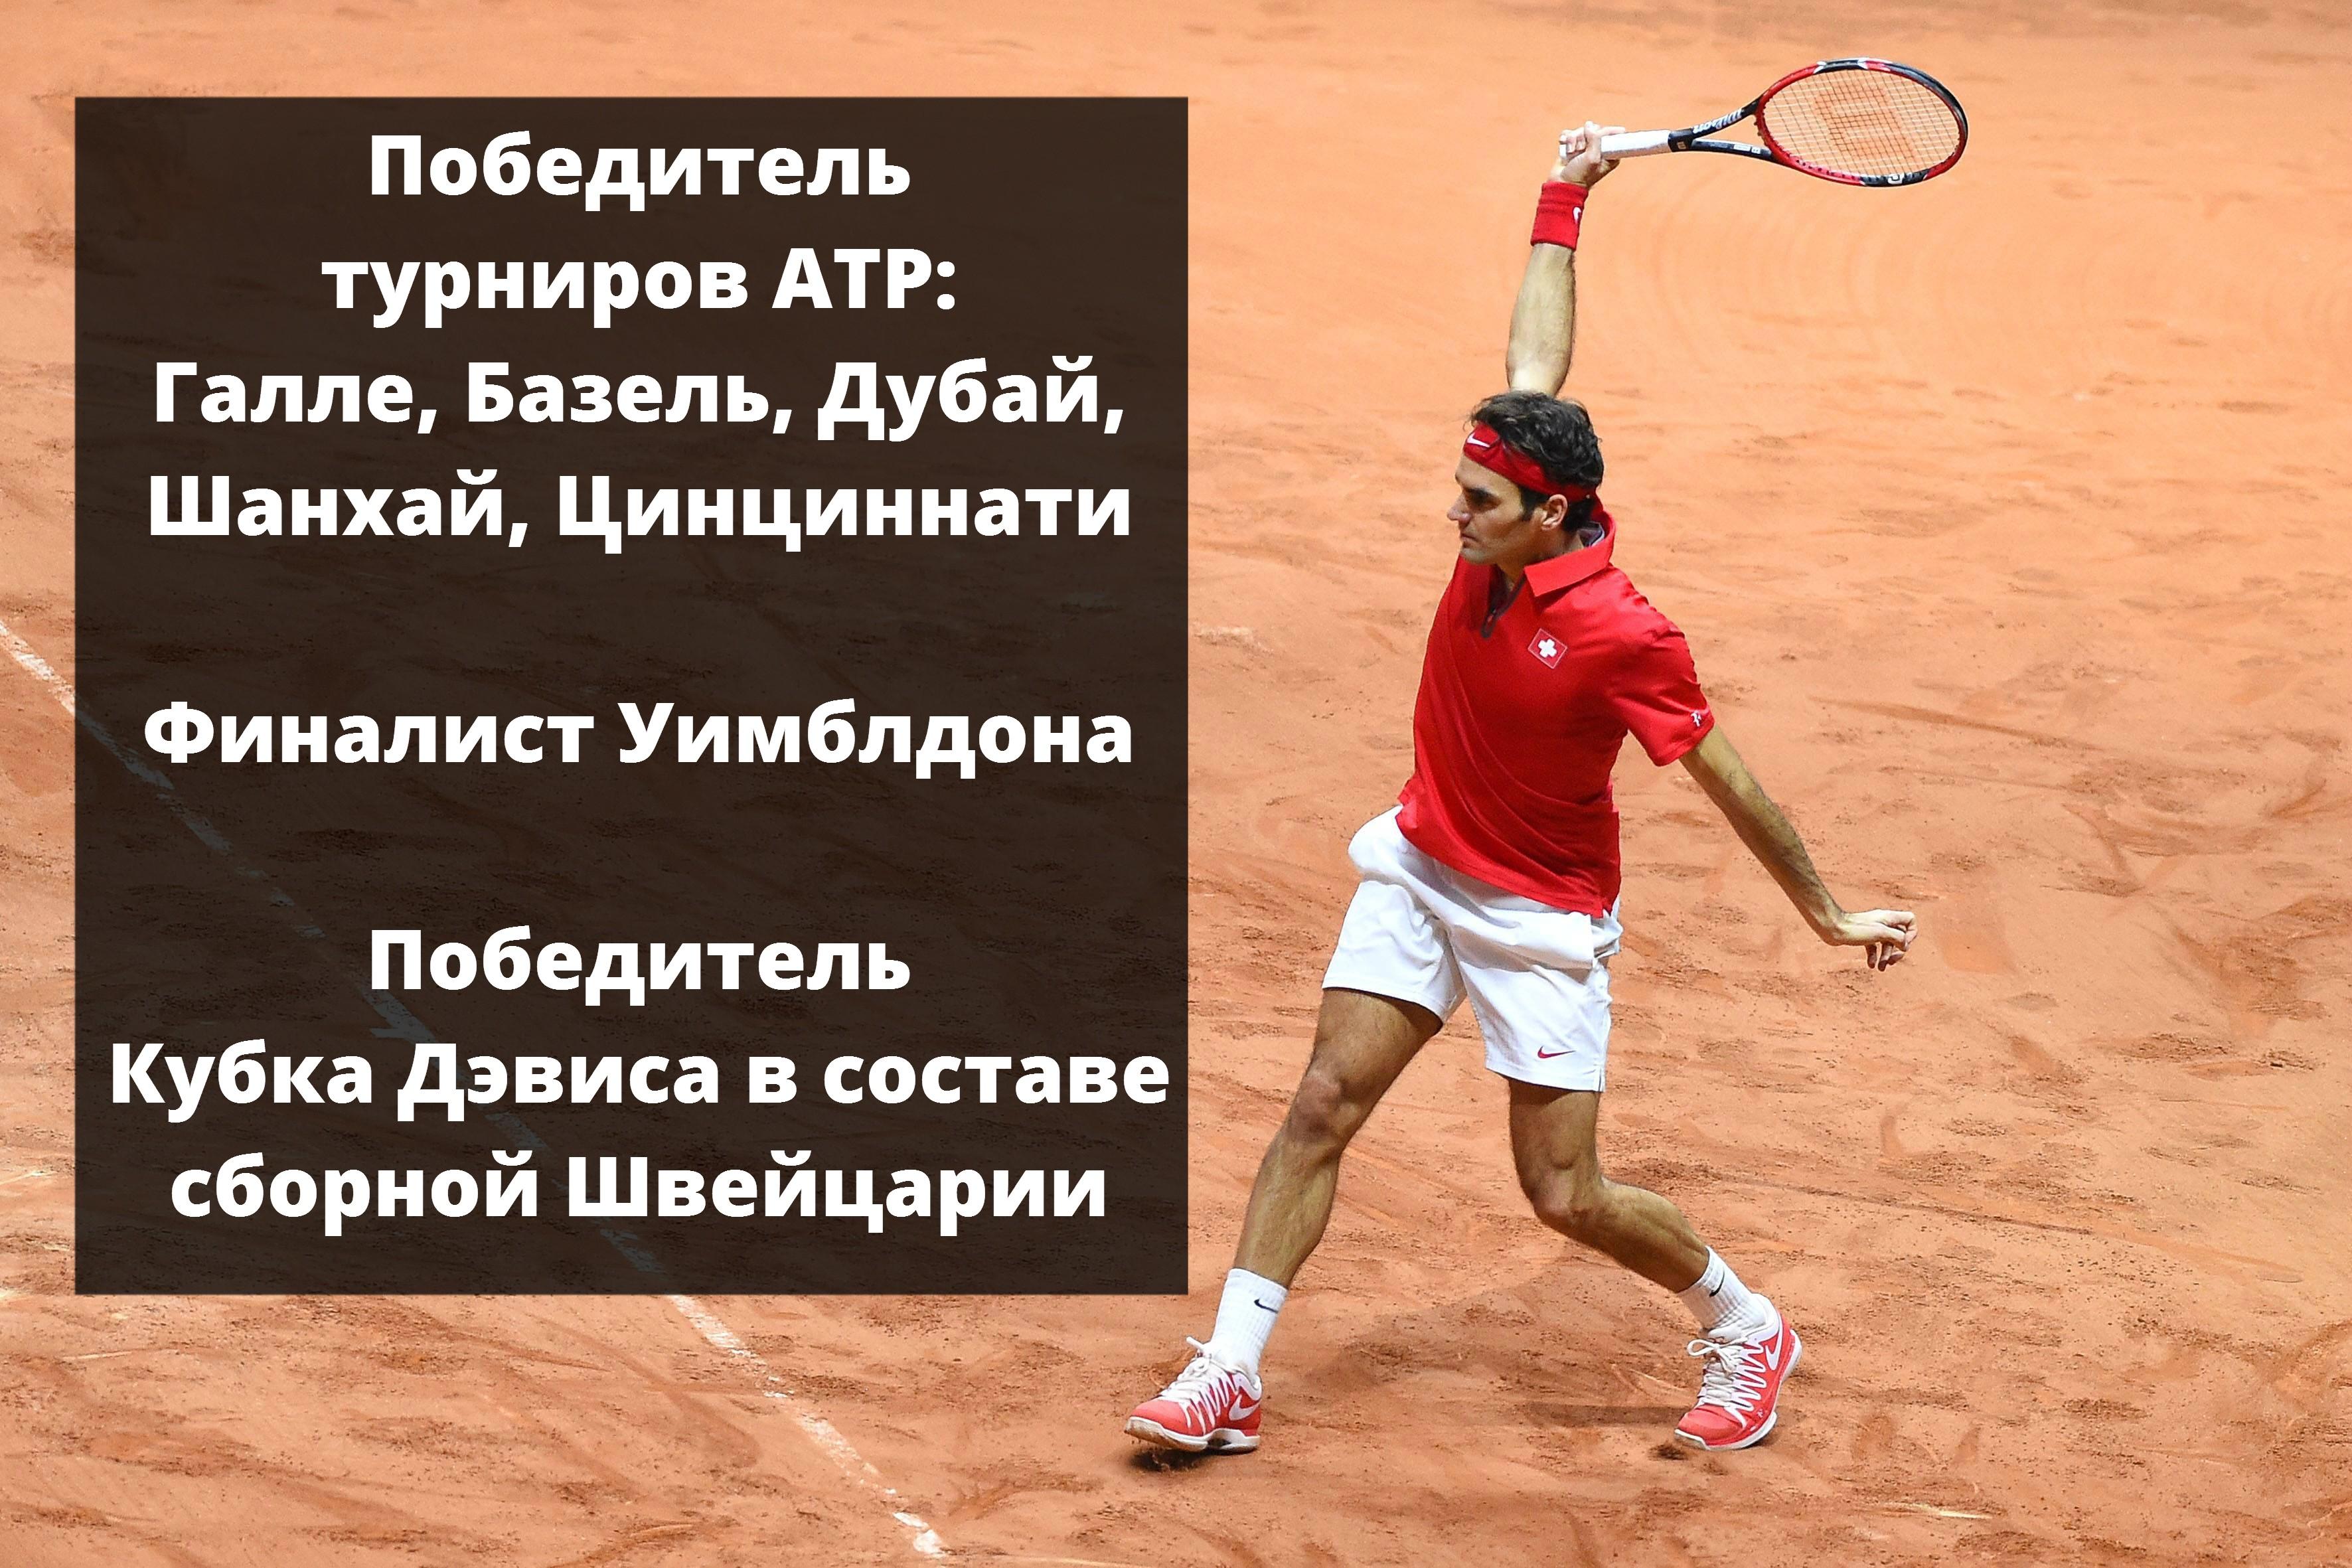 https://i.eurosport.com/2014/12/22/1376829.jpg